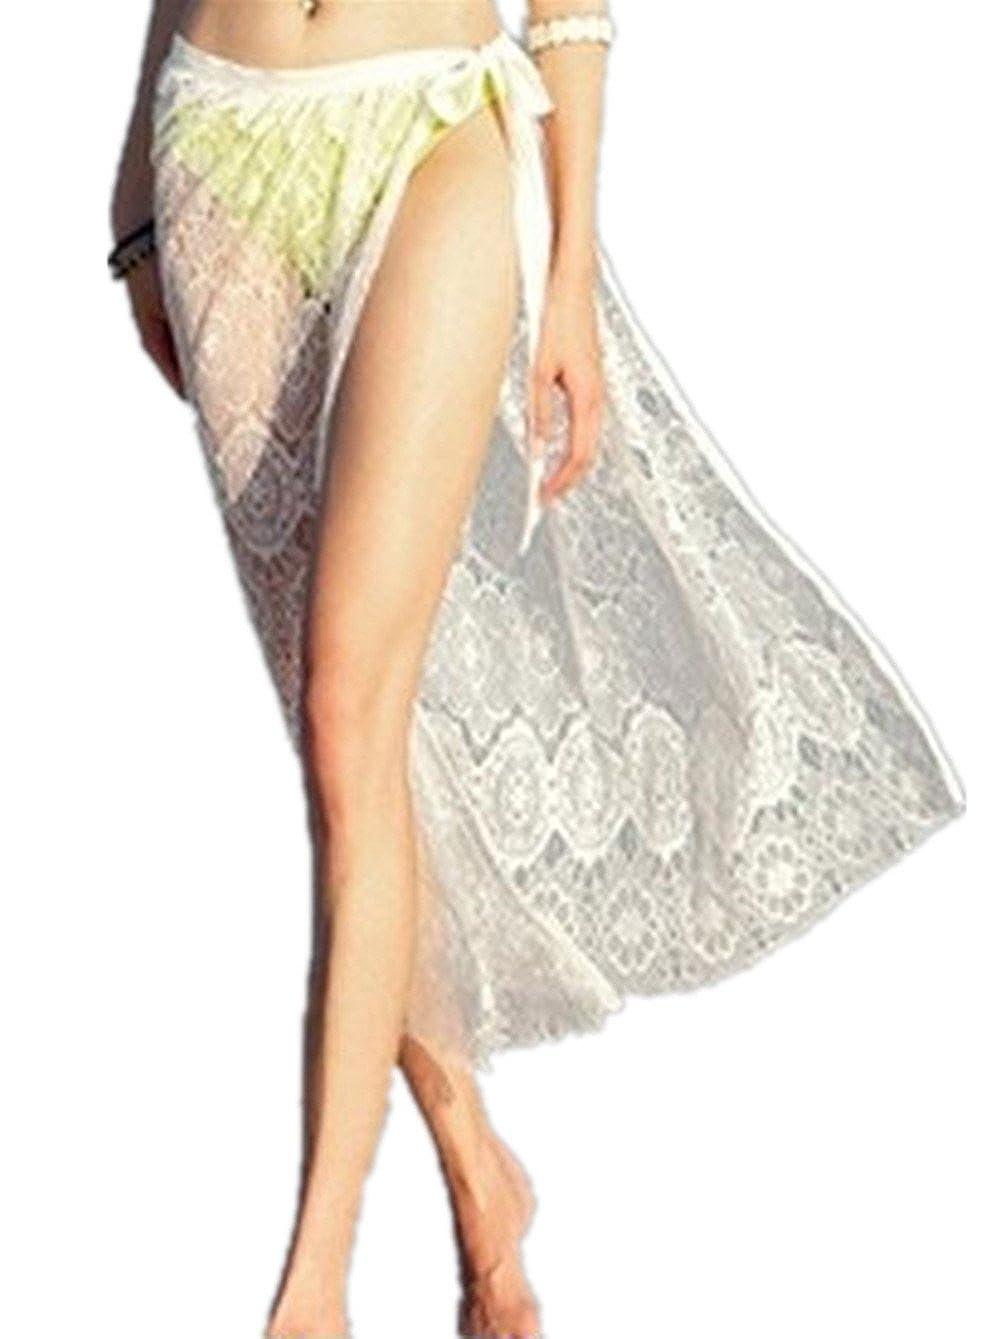 Q&Y Woemen's Mesh Split Sarong Bikini Swimwear Beach Dress Lace Swimsuit Wrap Skirt 01047